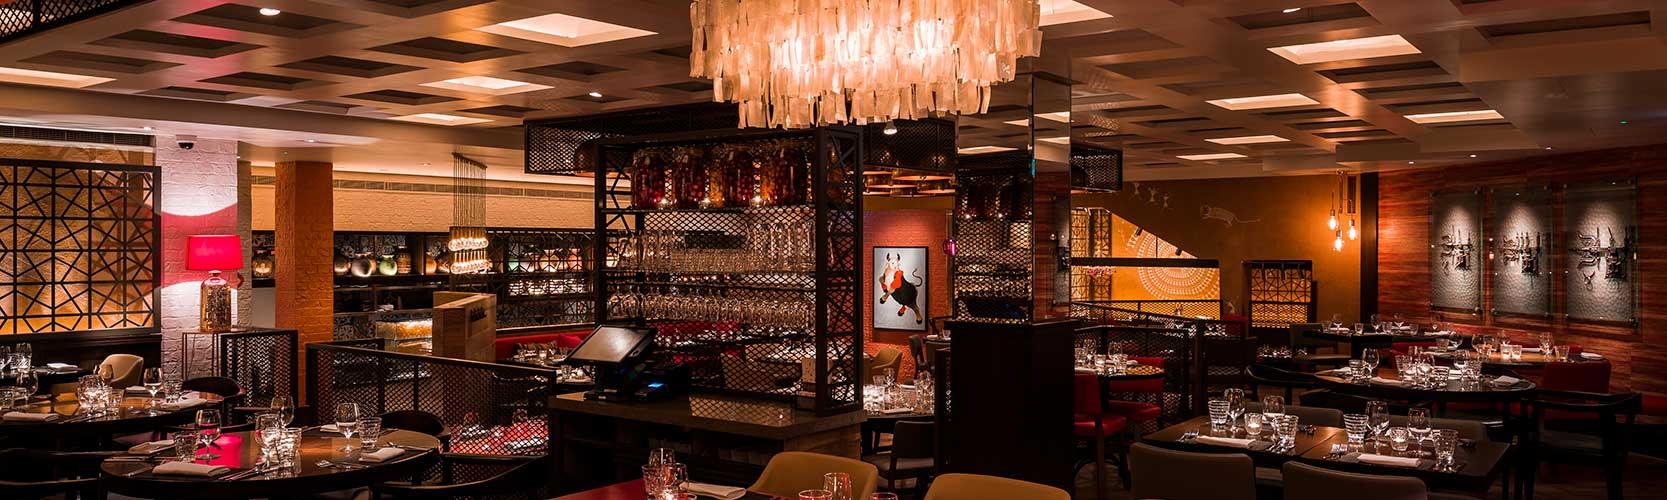 Masala Zone Soho| Best Indian Restaurant in Soho & London | Masala Zone